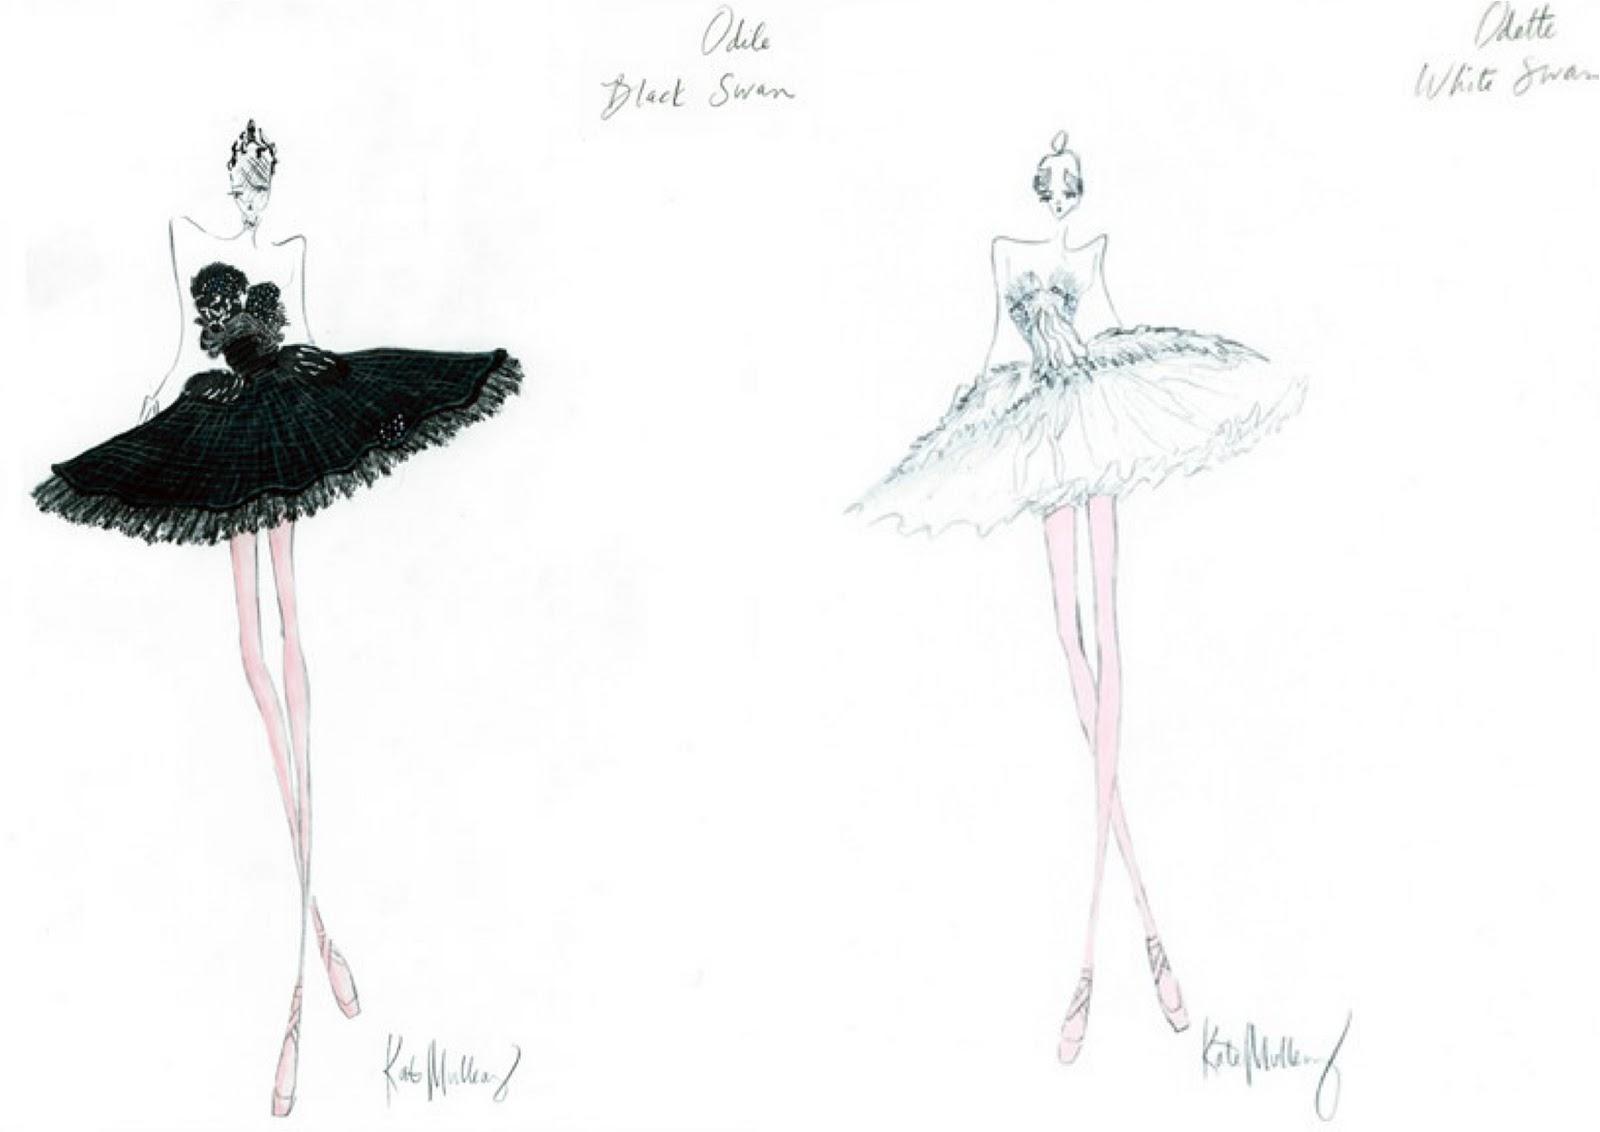 http://1.bp.blogspot.com/-2Z6zLl60i2E/TV05vsjvyMI/AAAAAAAAAUk/q-Ru8cnPLiw/s1600/rodarte-sketches-black-swan-lamodellamafia.com_.jpg